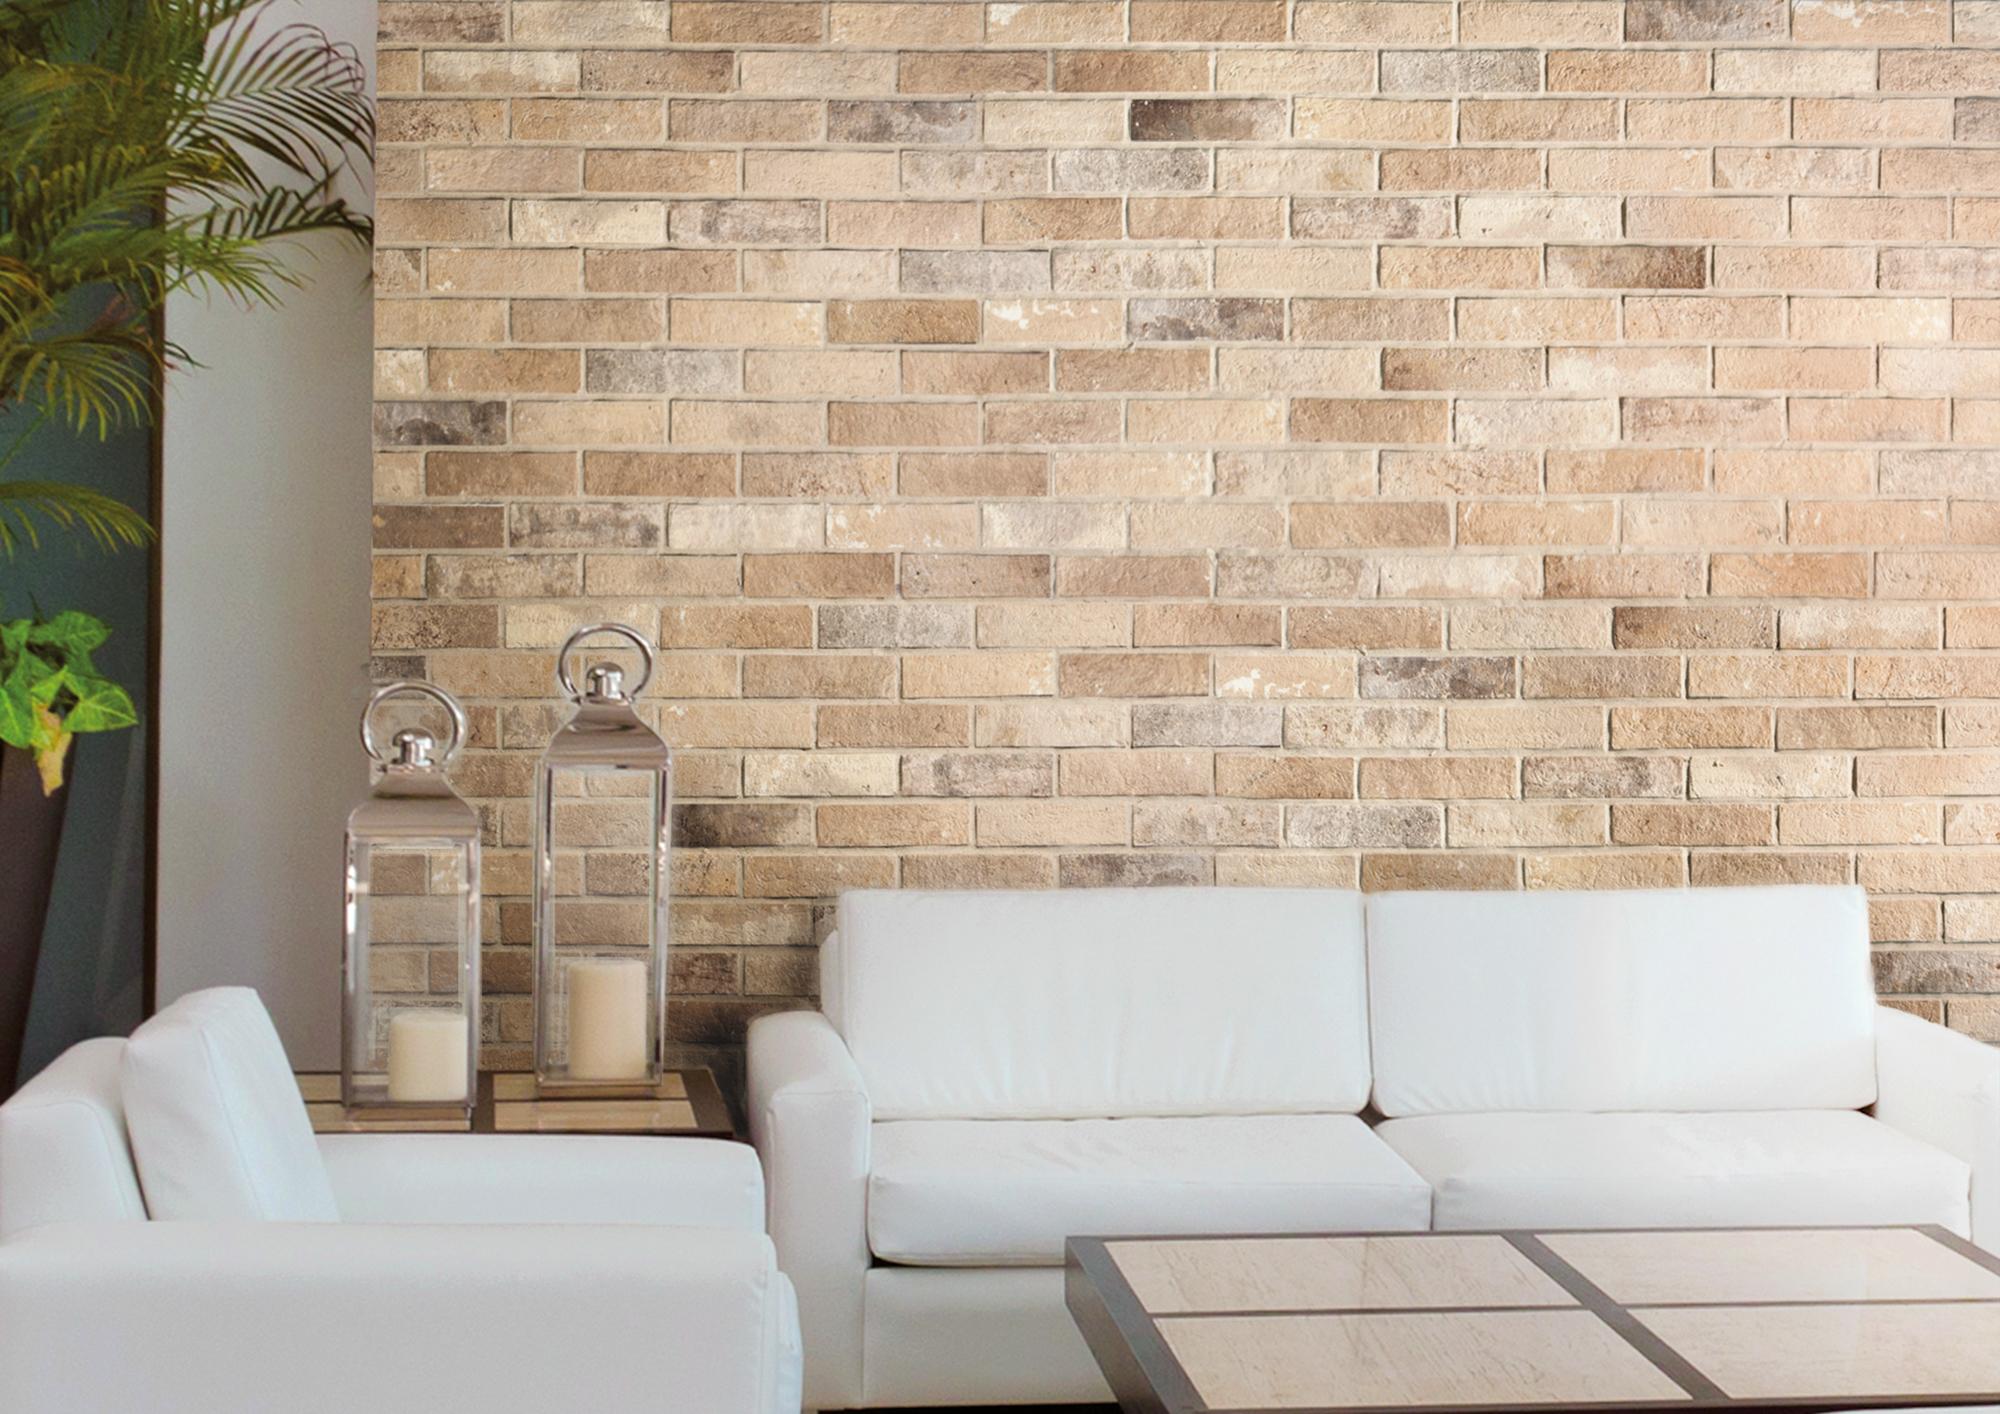 Rondine bristol bricks pavers italian porcelain tile sizes dailygadgetfo Images